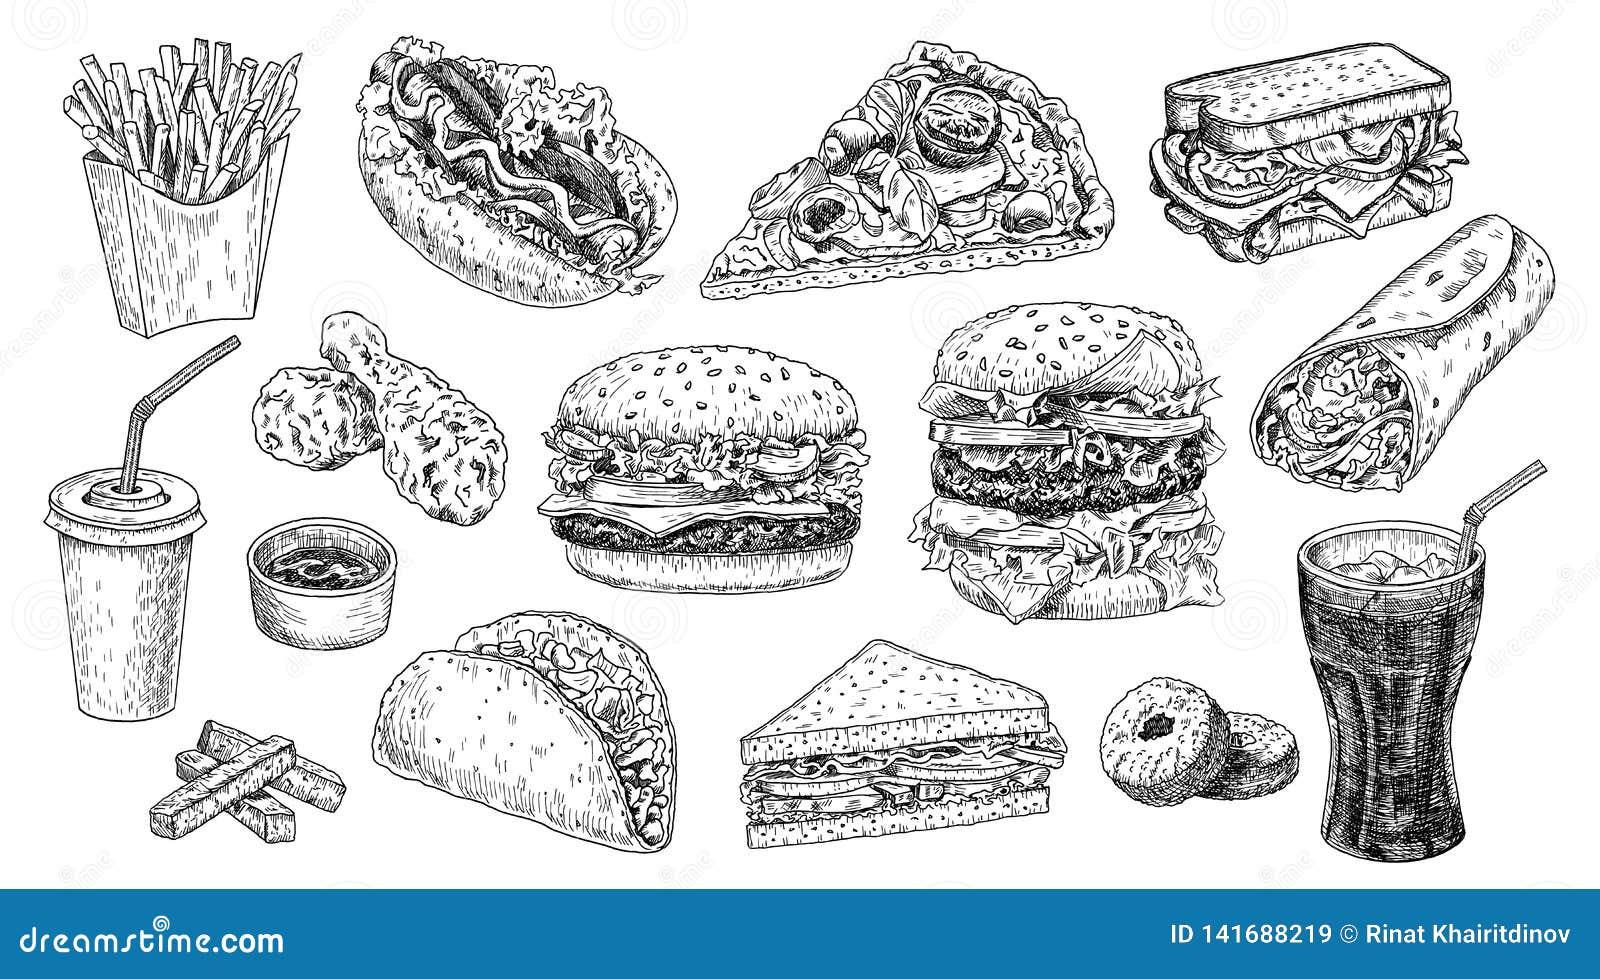 Fast food set hand drawn vector illustration. Hamburger, cheeseburger, sandwich, pizza, chicken, cola, hot dog.